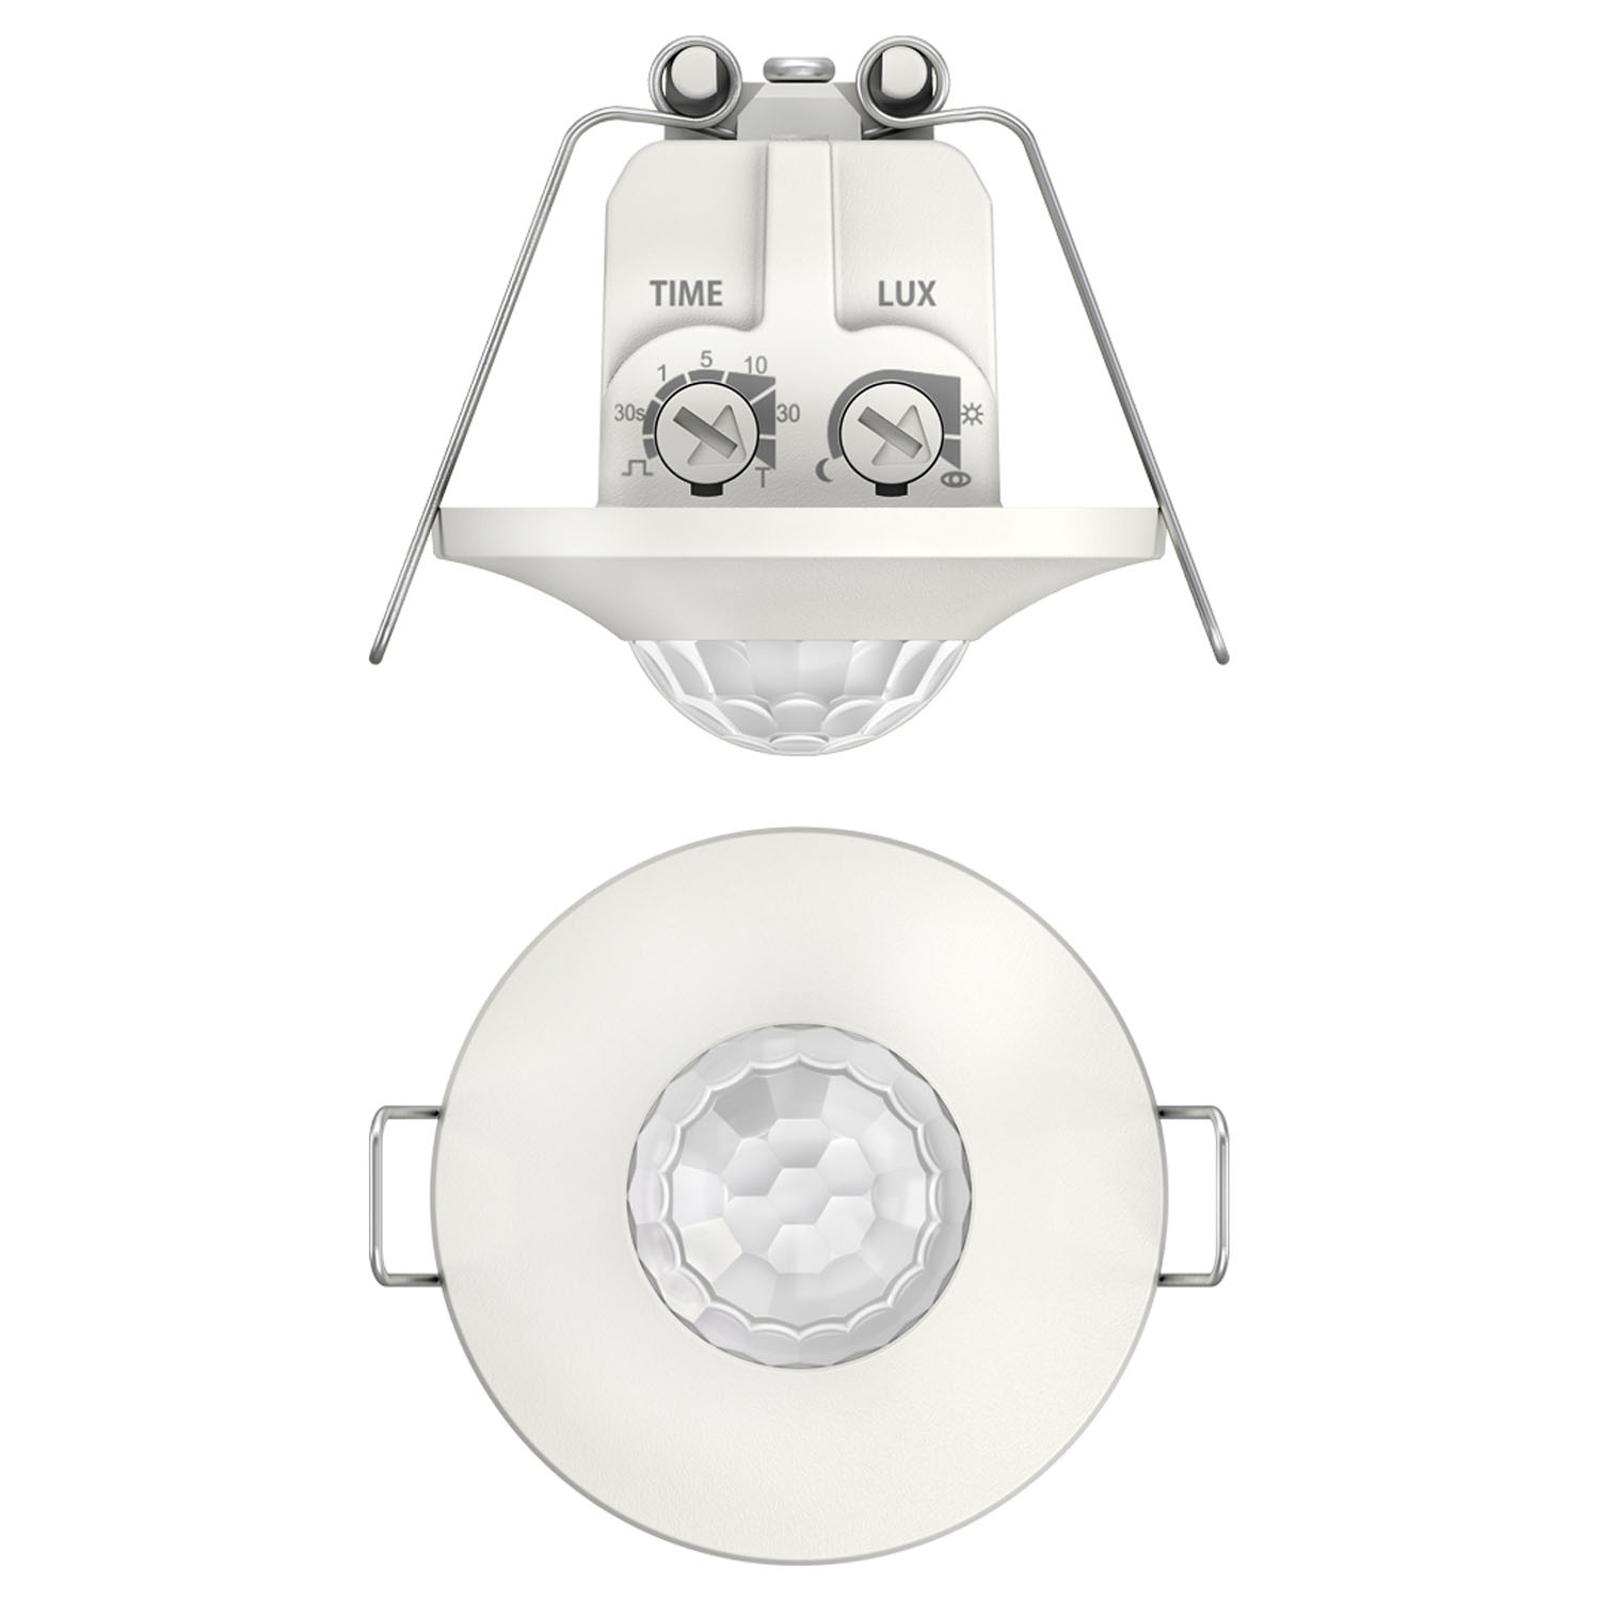 Theben thePiccola P360-100 DE sensore pres. bianco